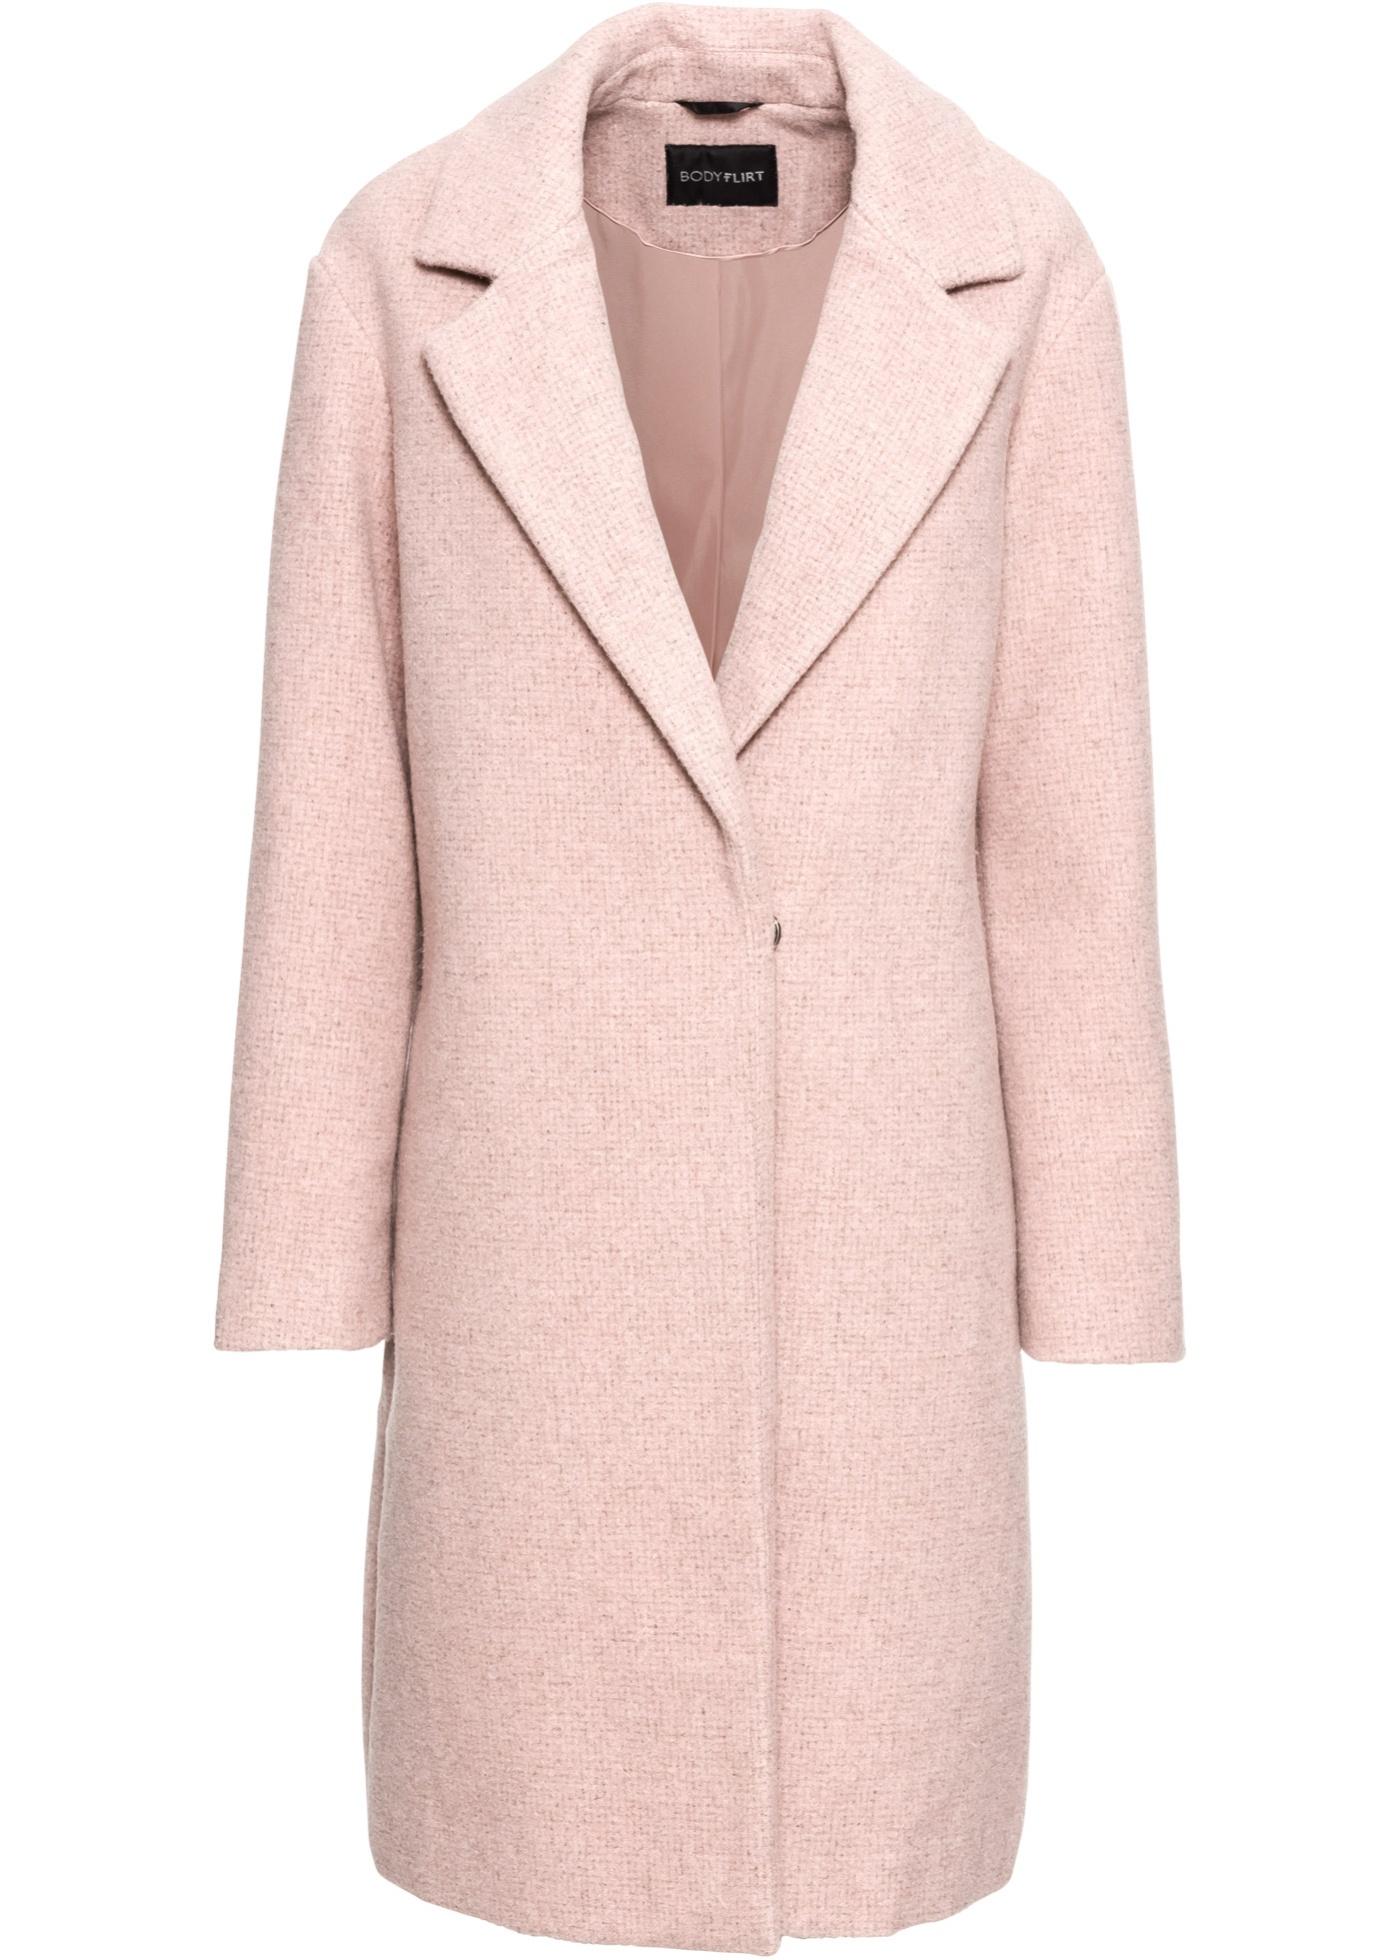 Mouw In Dames Coat Bodyflirt Lange Roze Korte vn8wOm0N